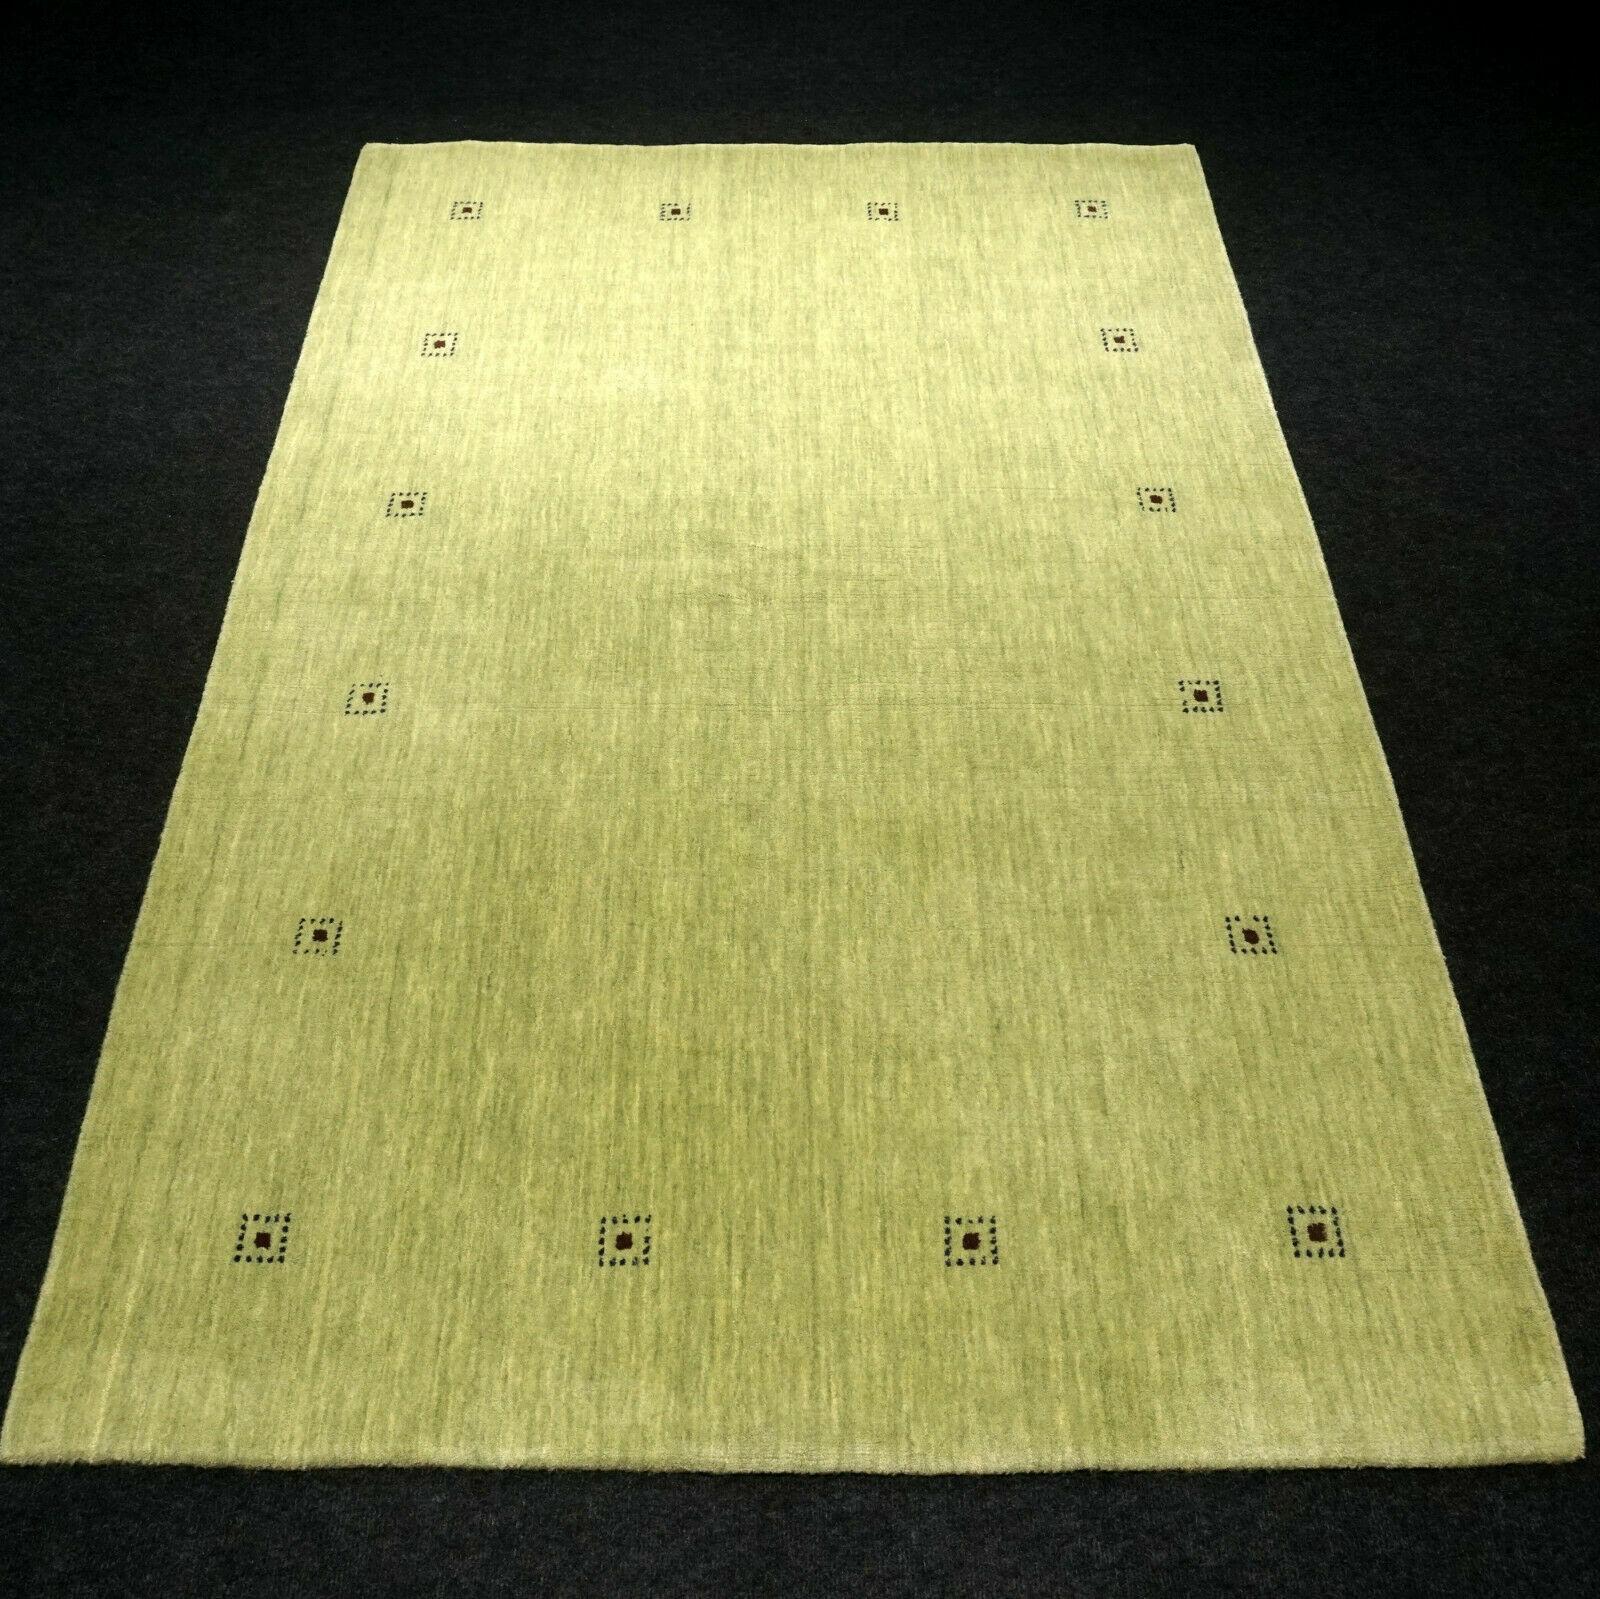 Designer Orient Orient Orient Teppich 182 x 120 cm Grün Loribaft Carpet Rug Tapijt Alfombra 9b4b4a